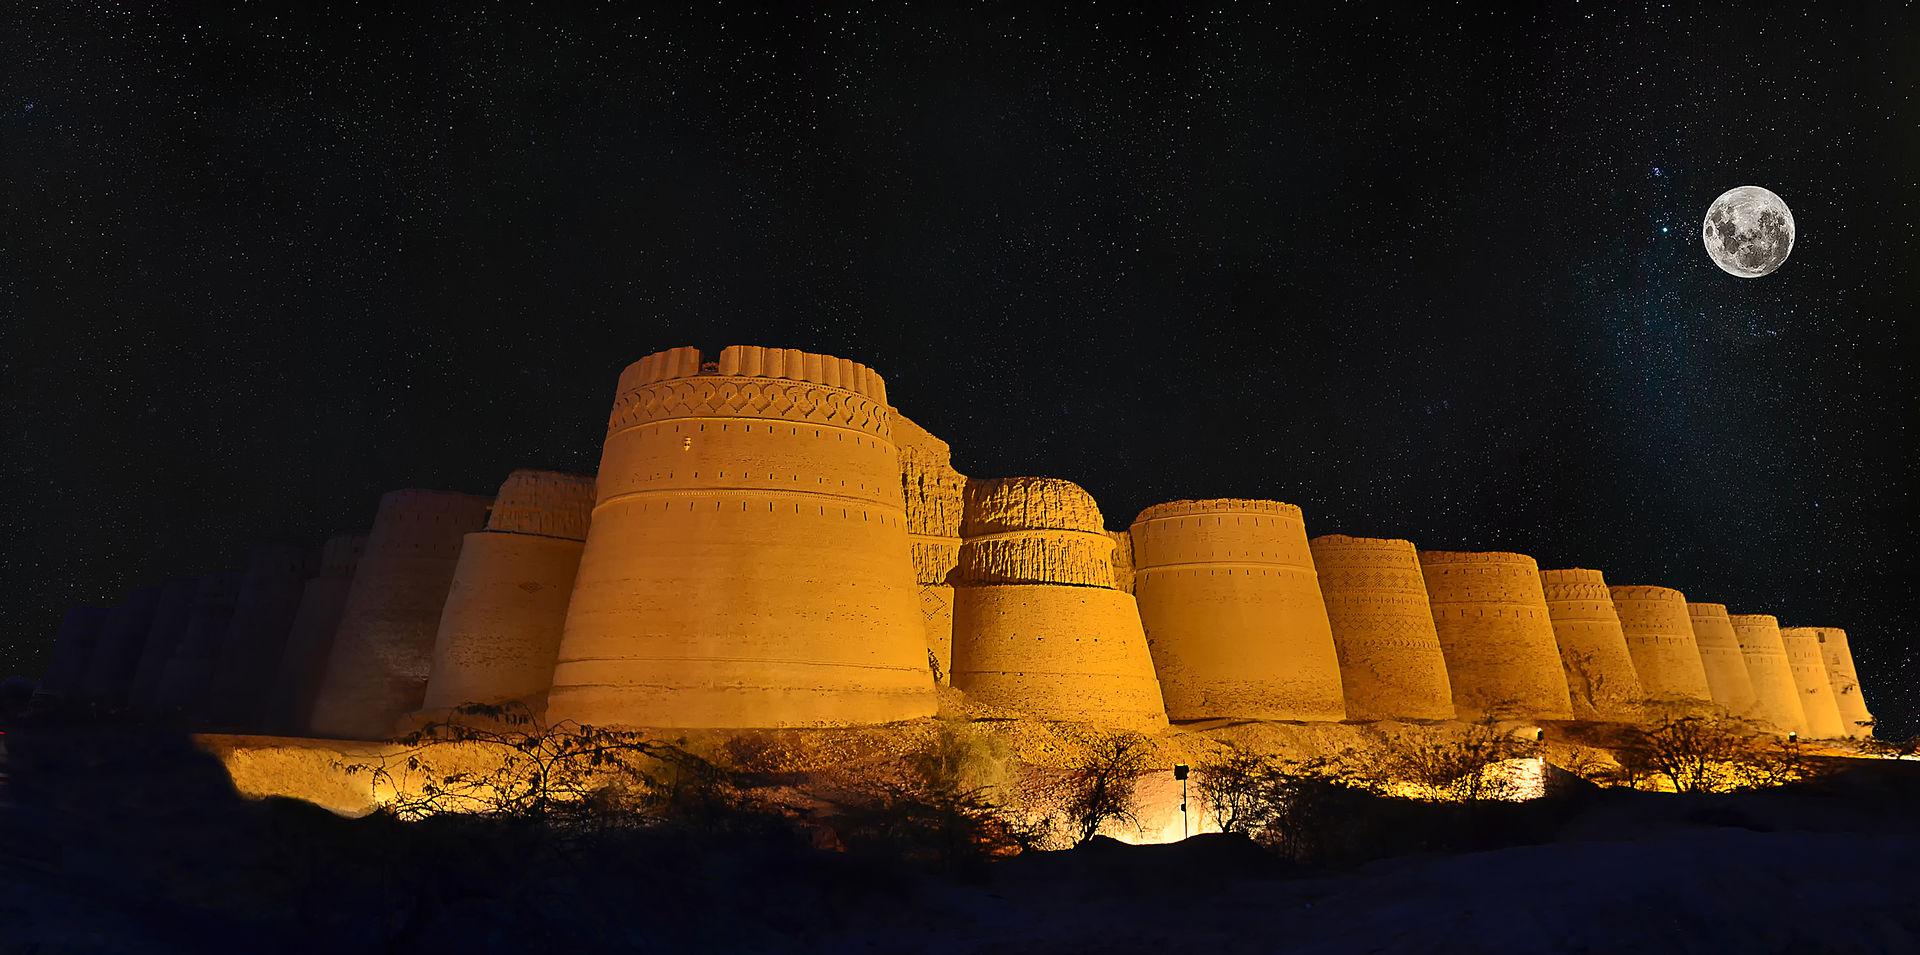 Derawar_Fort_at_Night